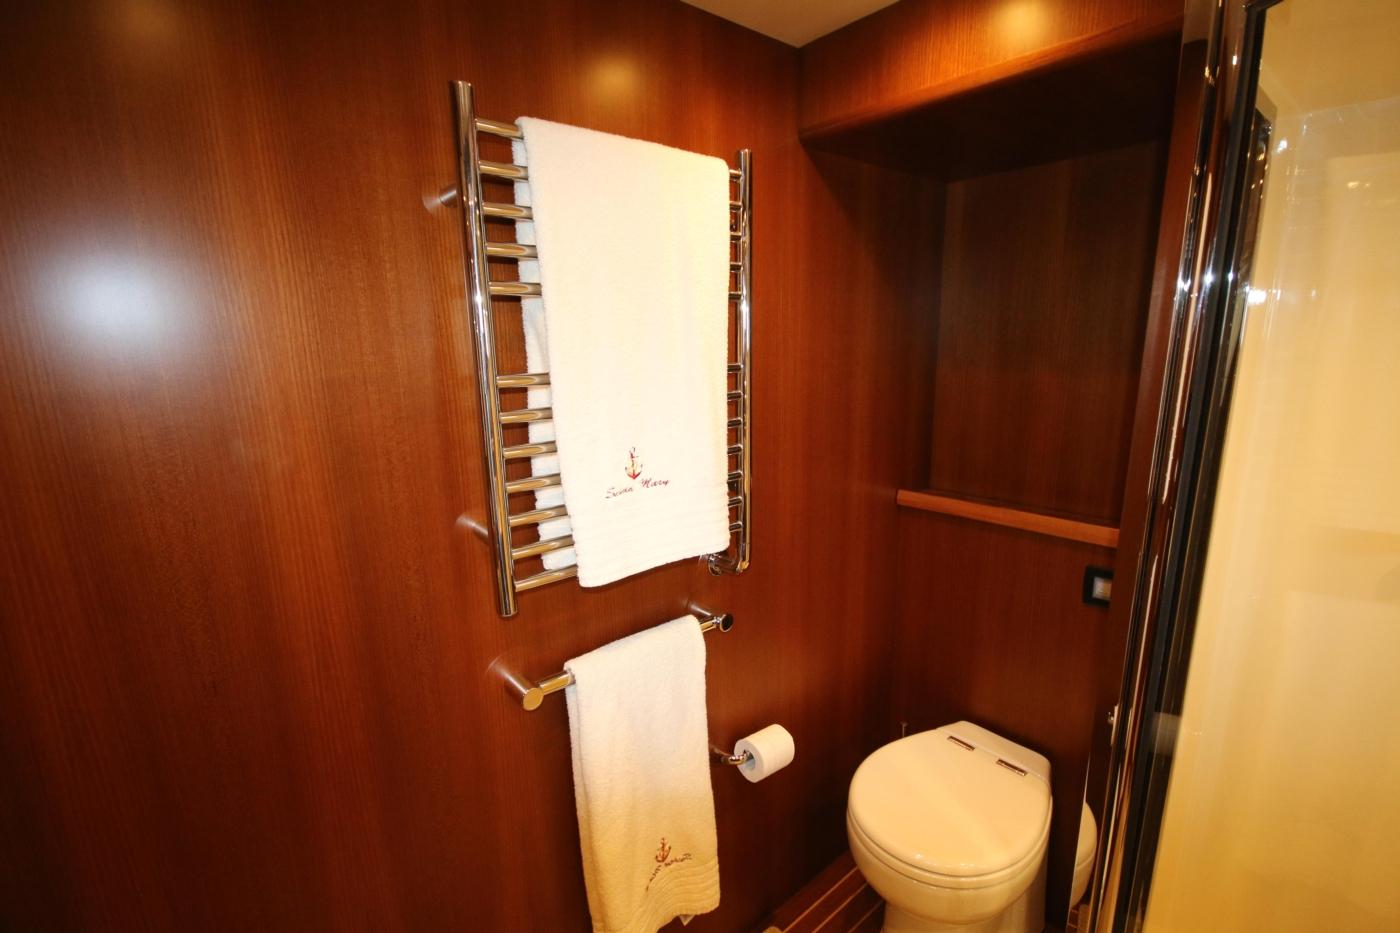 2015 Fleming 58 Pilothouse, Heated towel rails